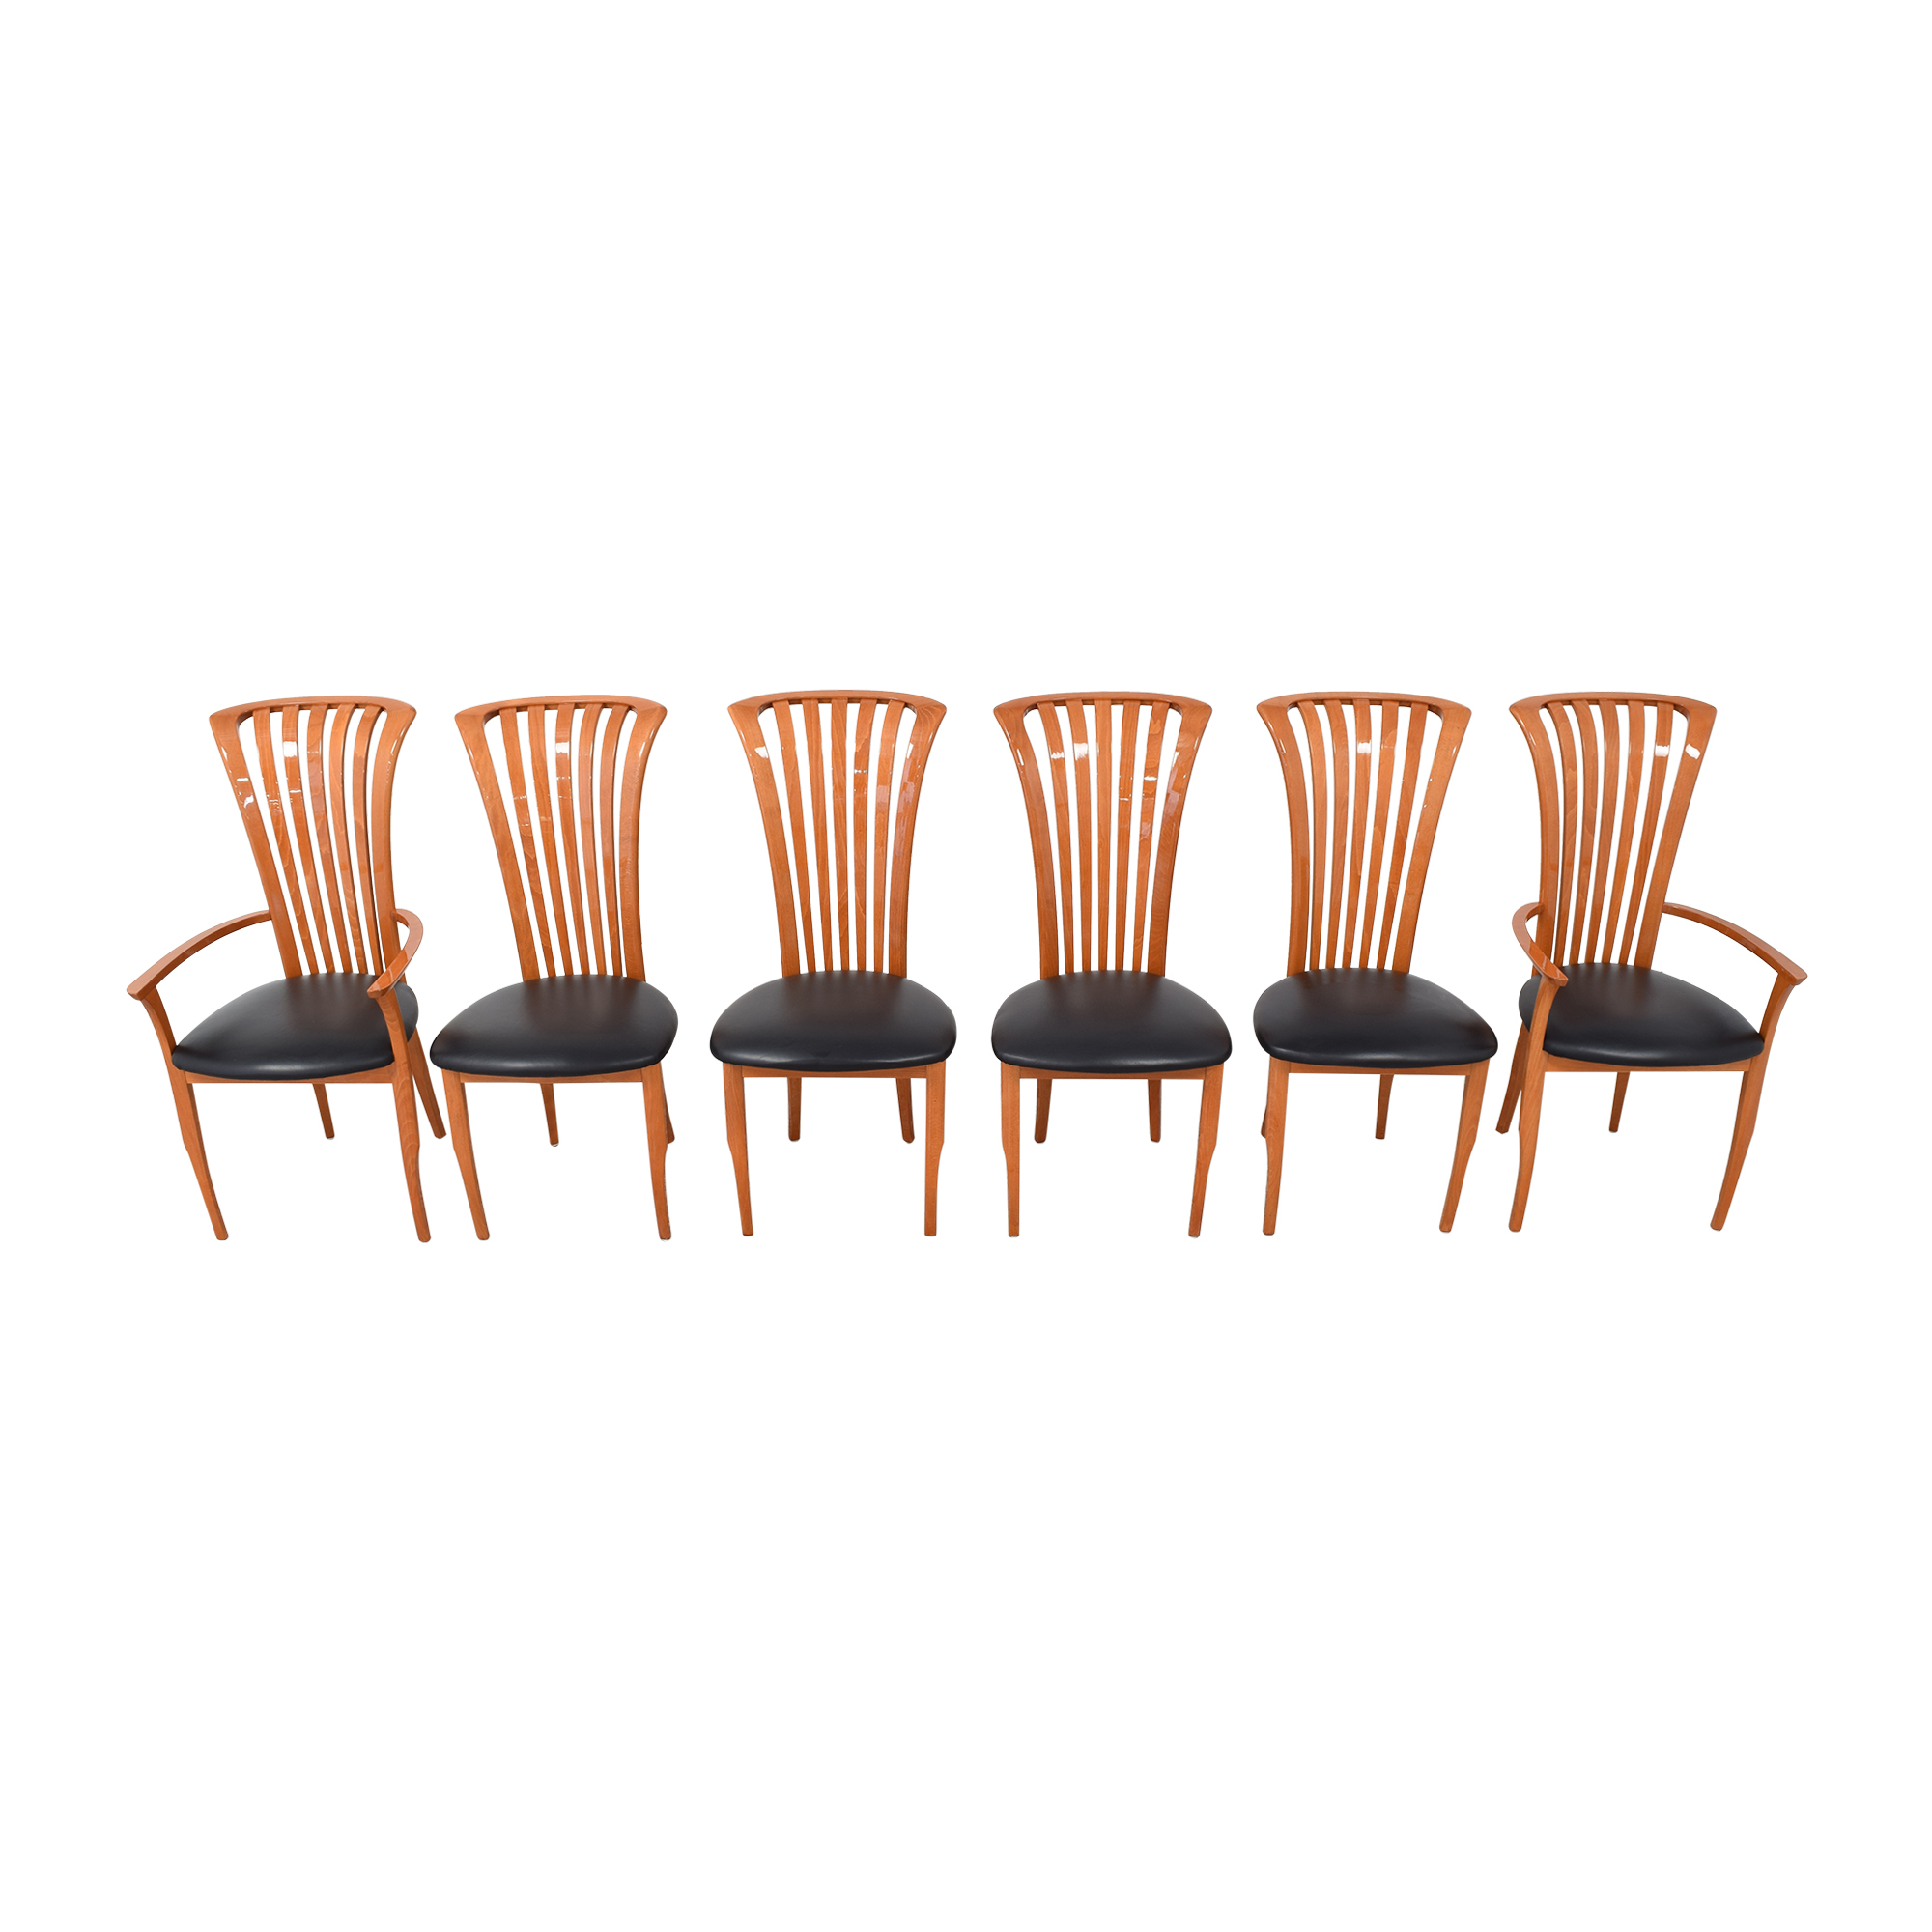 Pietro Costantini Modern Dining Chairs sale